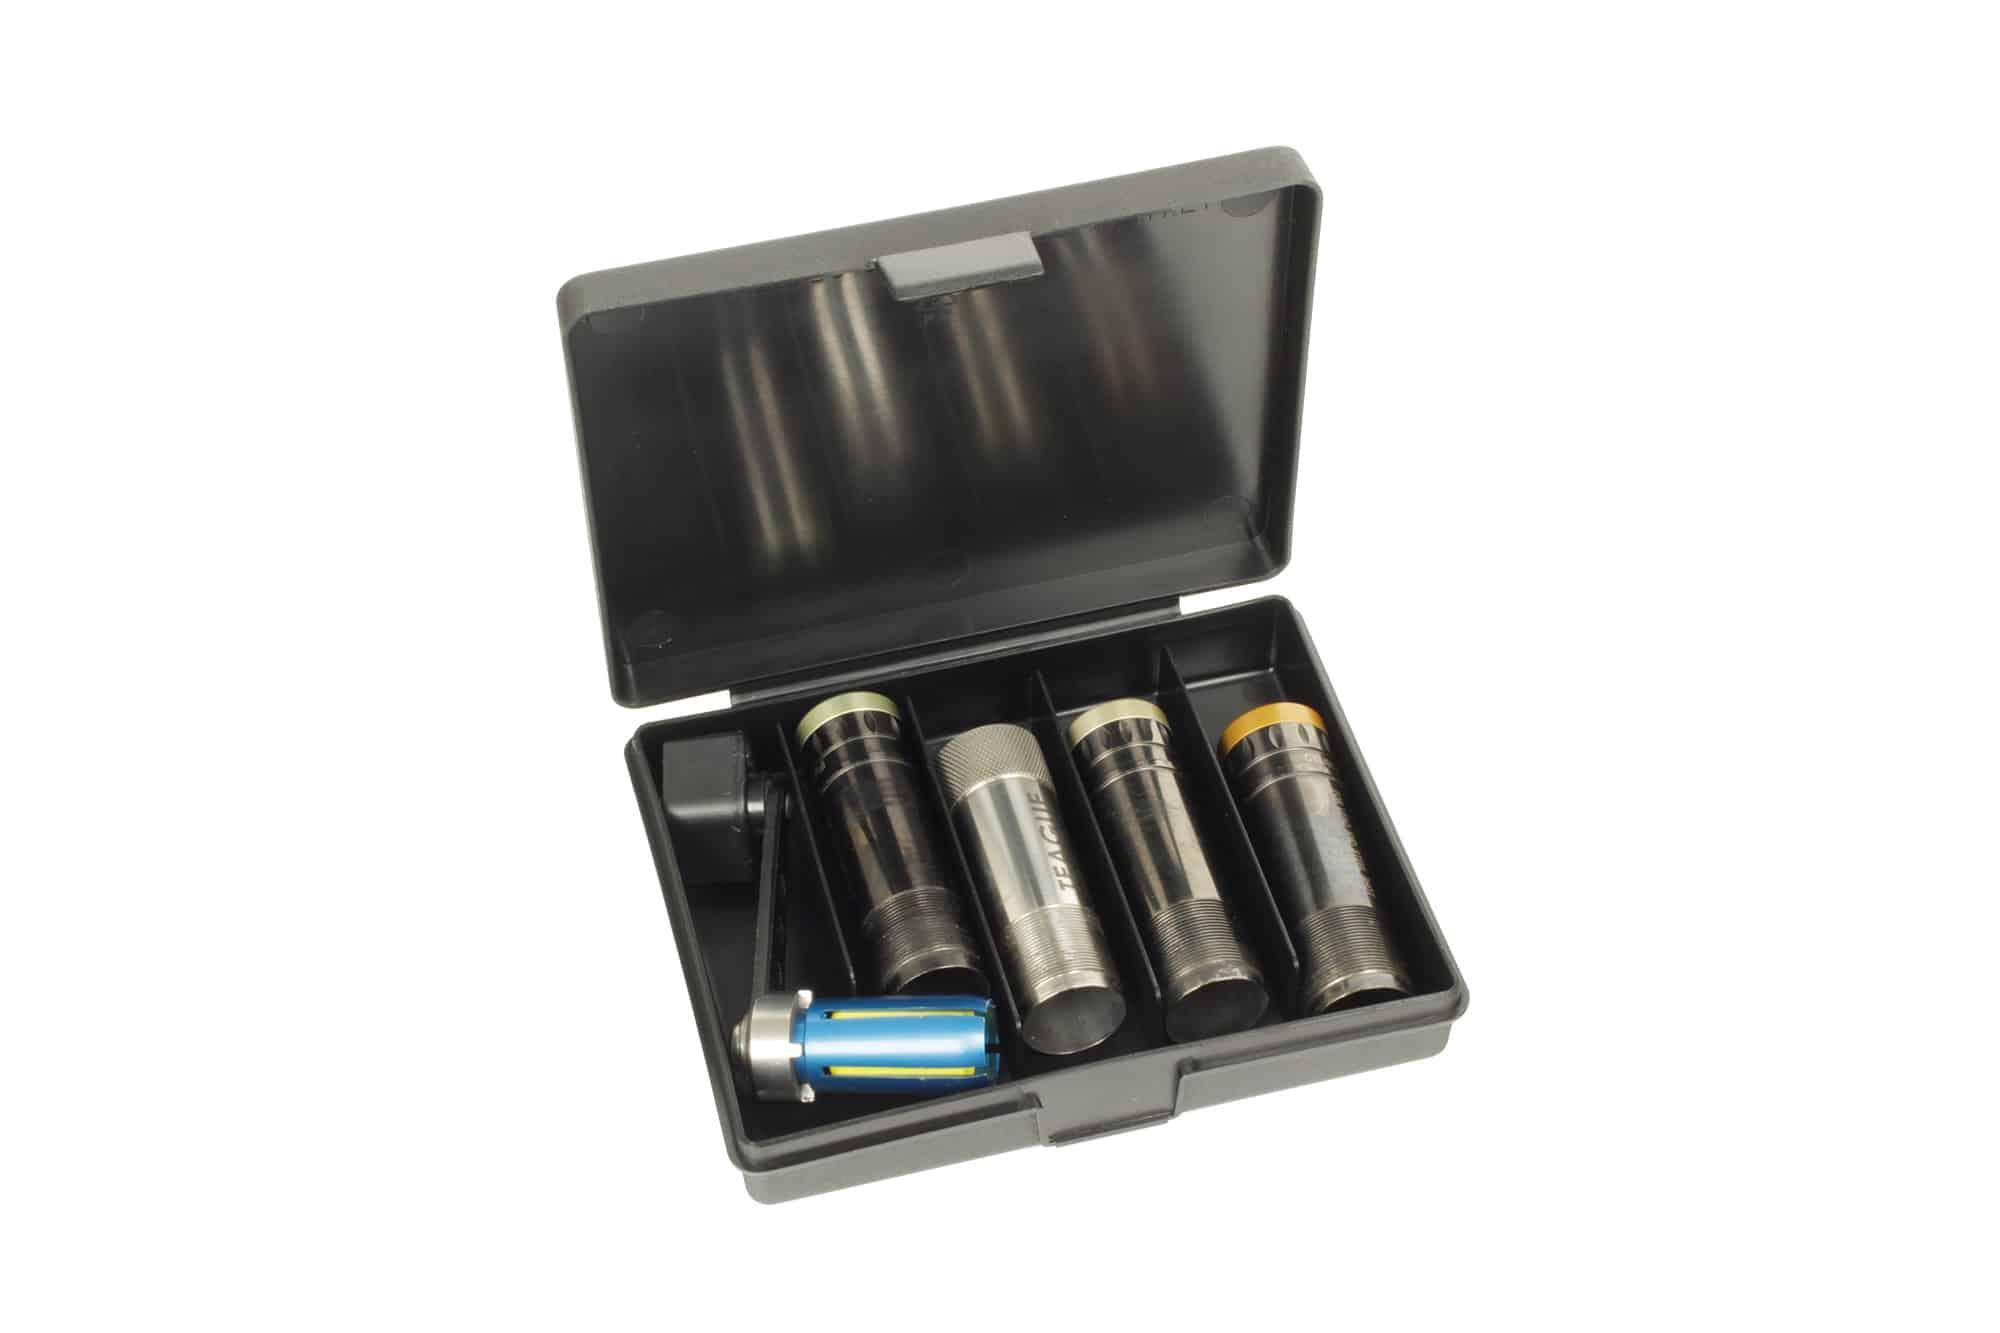 Negrini 3-5 Chokes Tubes + Wrench Case - 5019